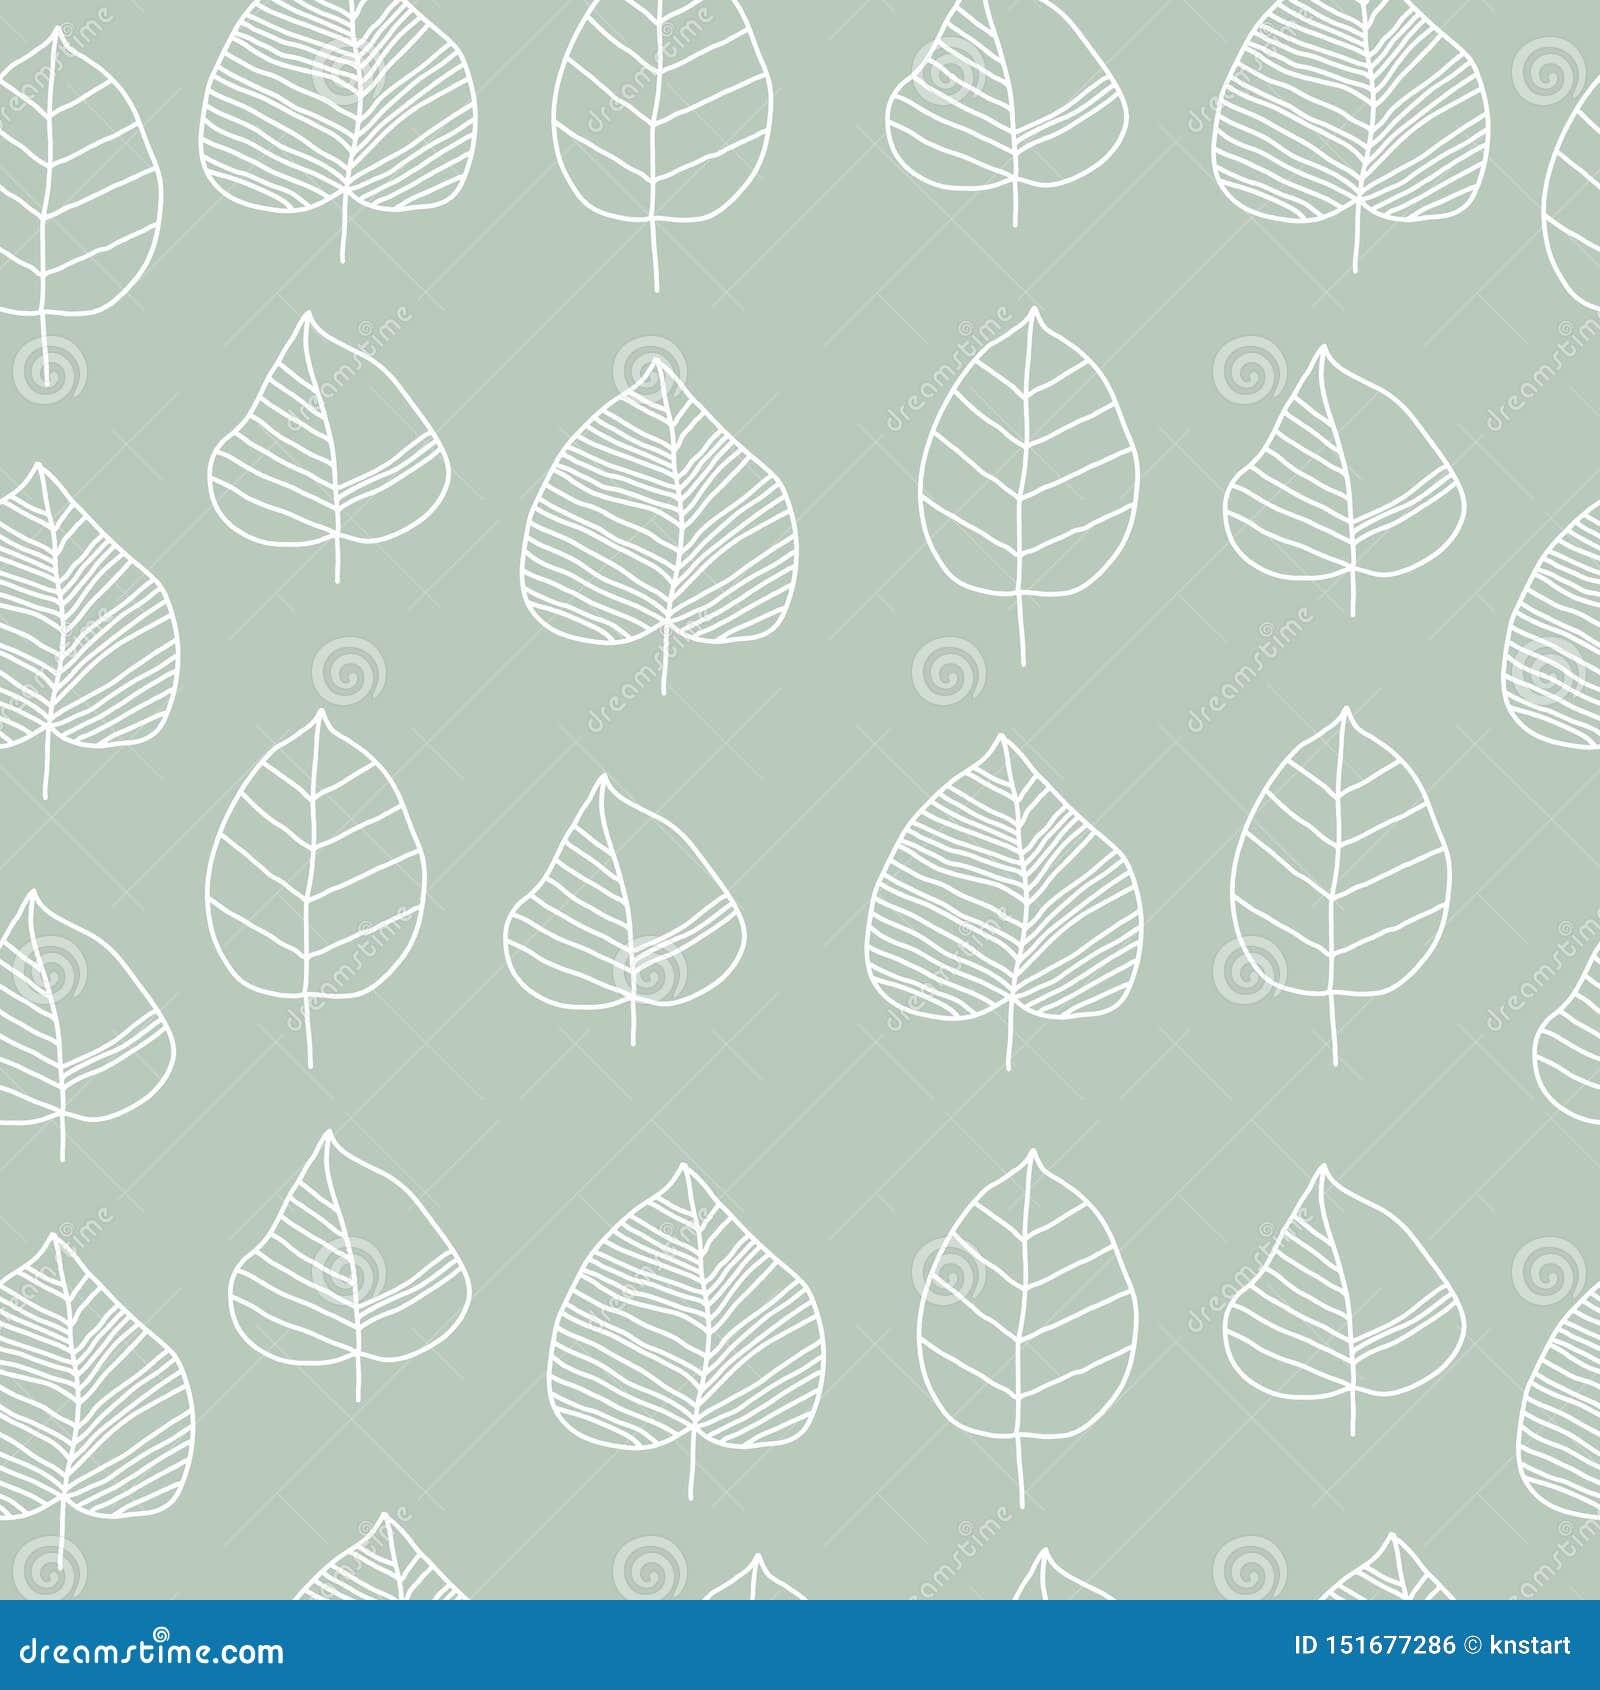 Unduh 54 Background Aesthetic Pastel Gratis Terbaik Download Background